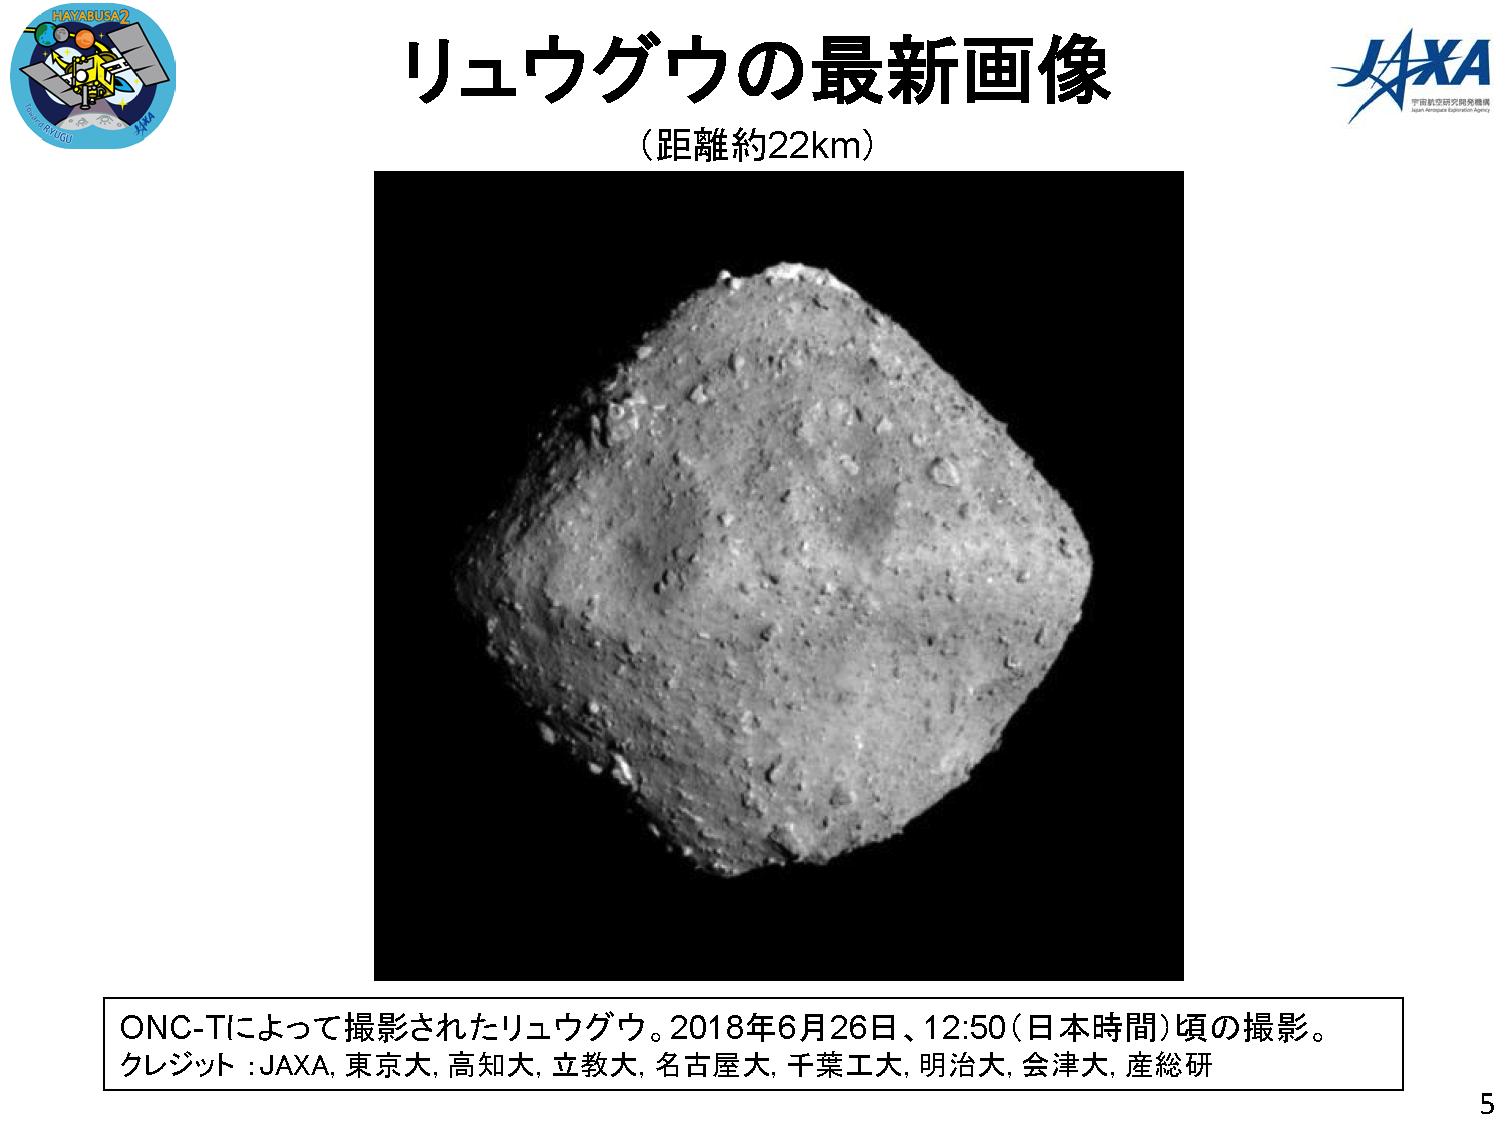 f:id:Imamura:20180627171834p:plain